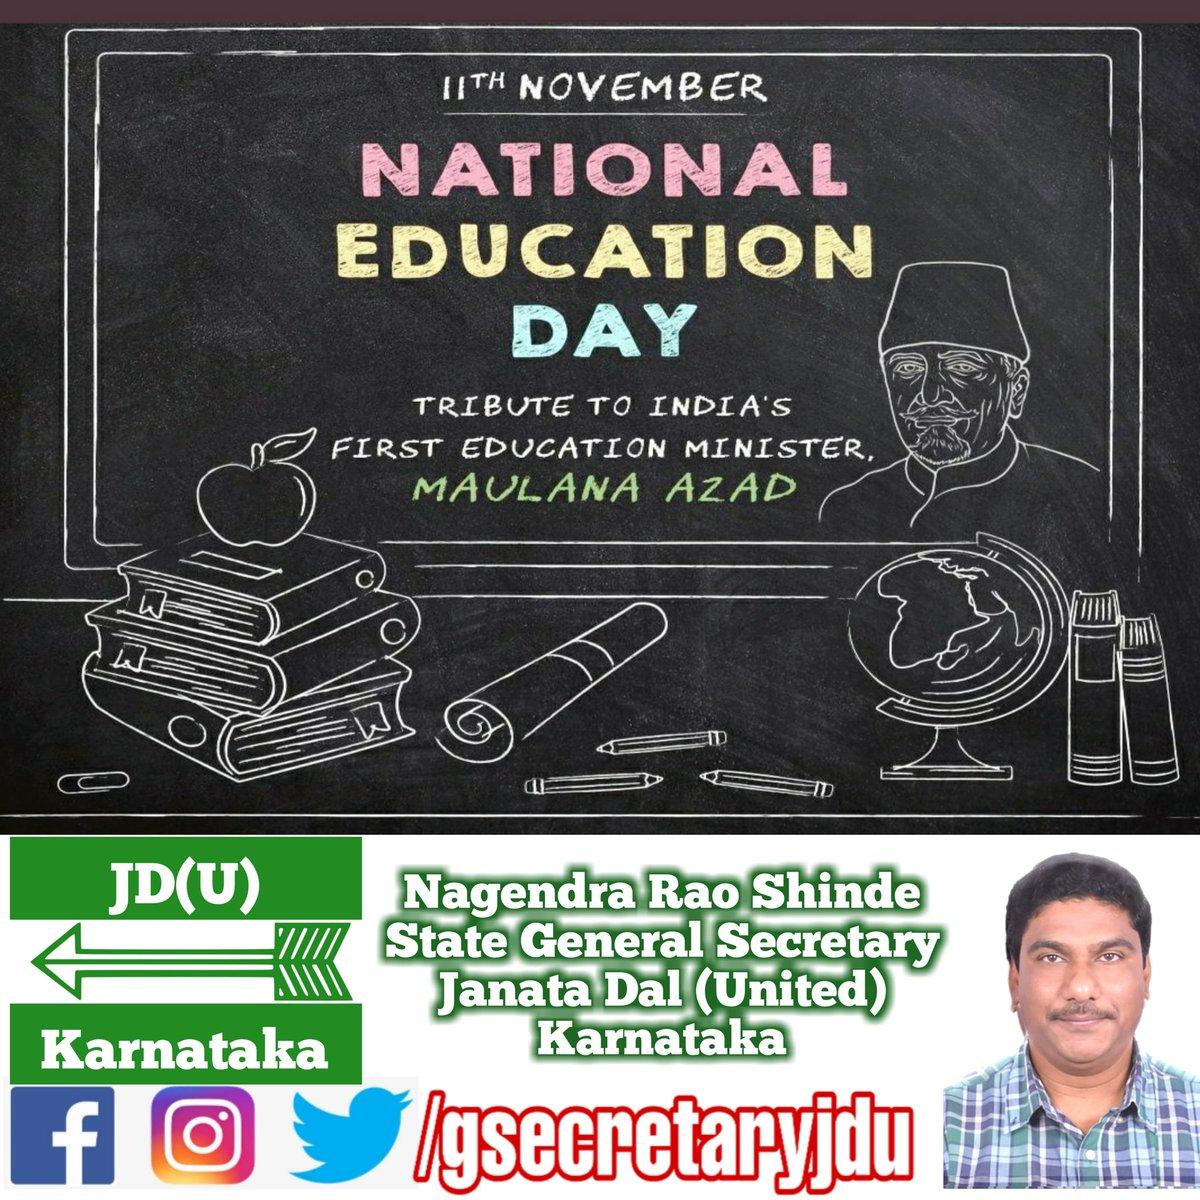 #NationalEducationDay #JDU #Karnataka https://t.co/MxtdntIj8D